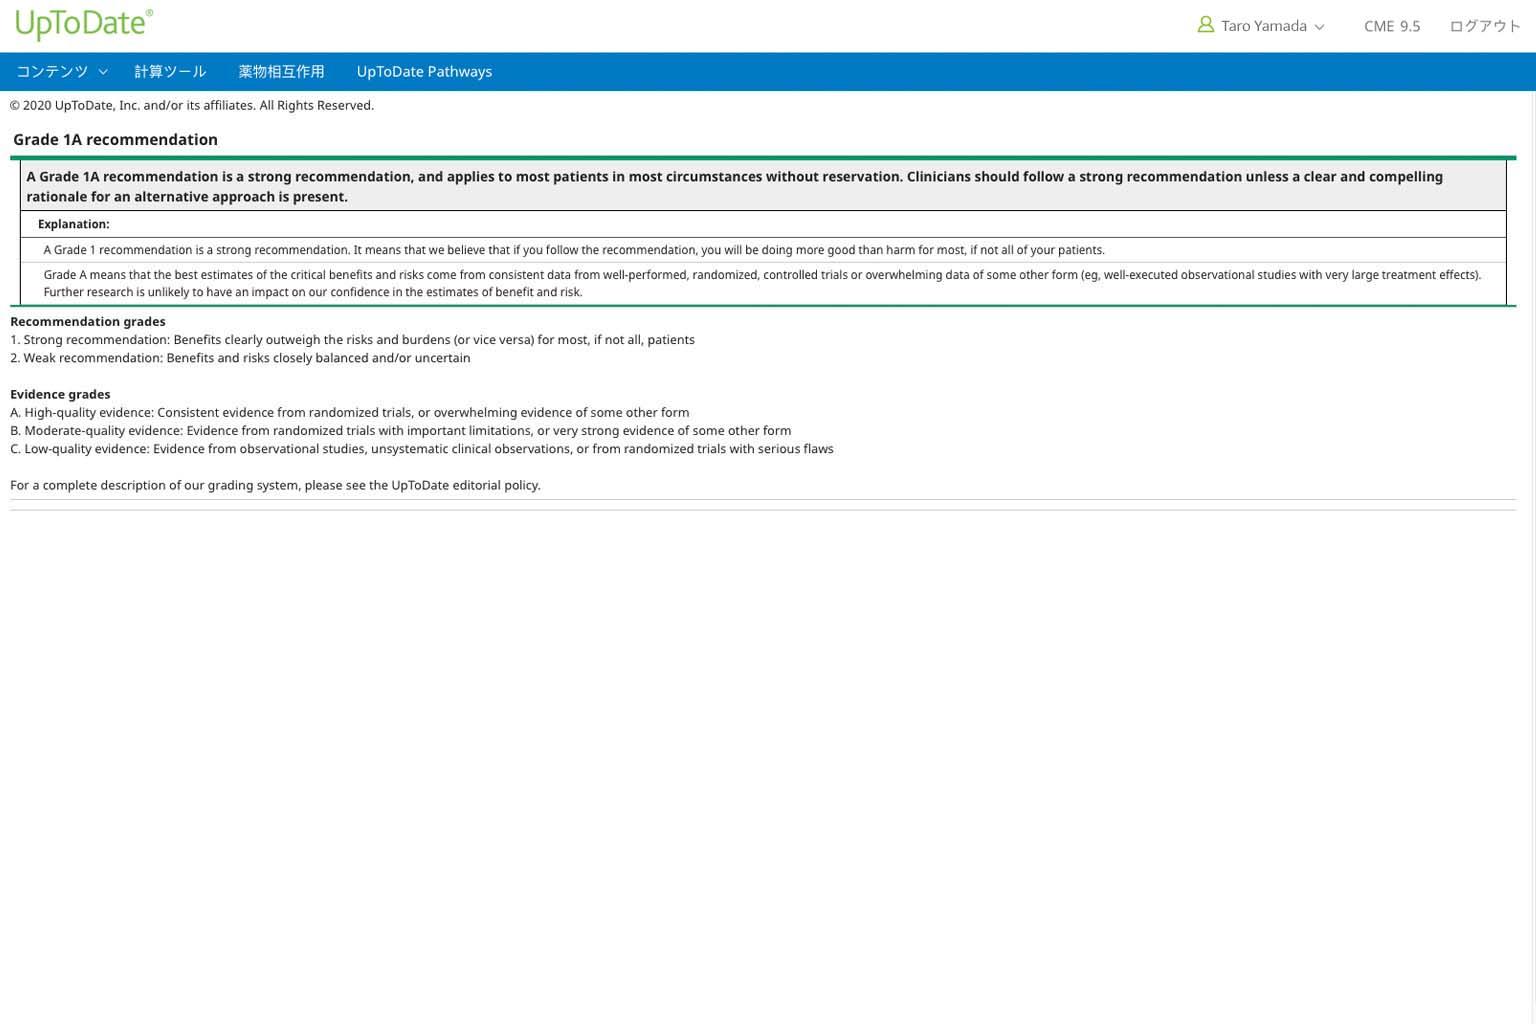 UpToDate graded recommendations video screenshot